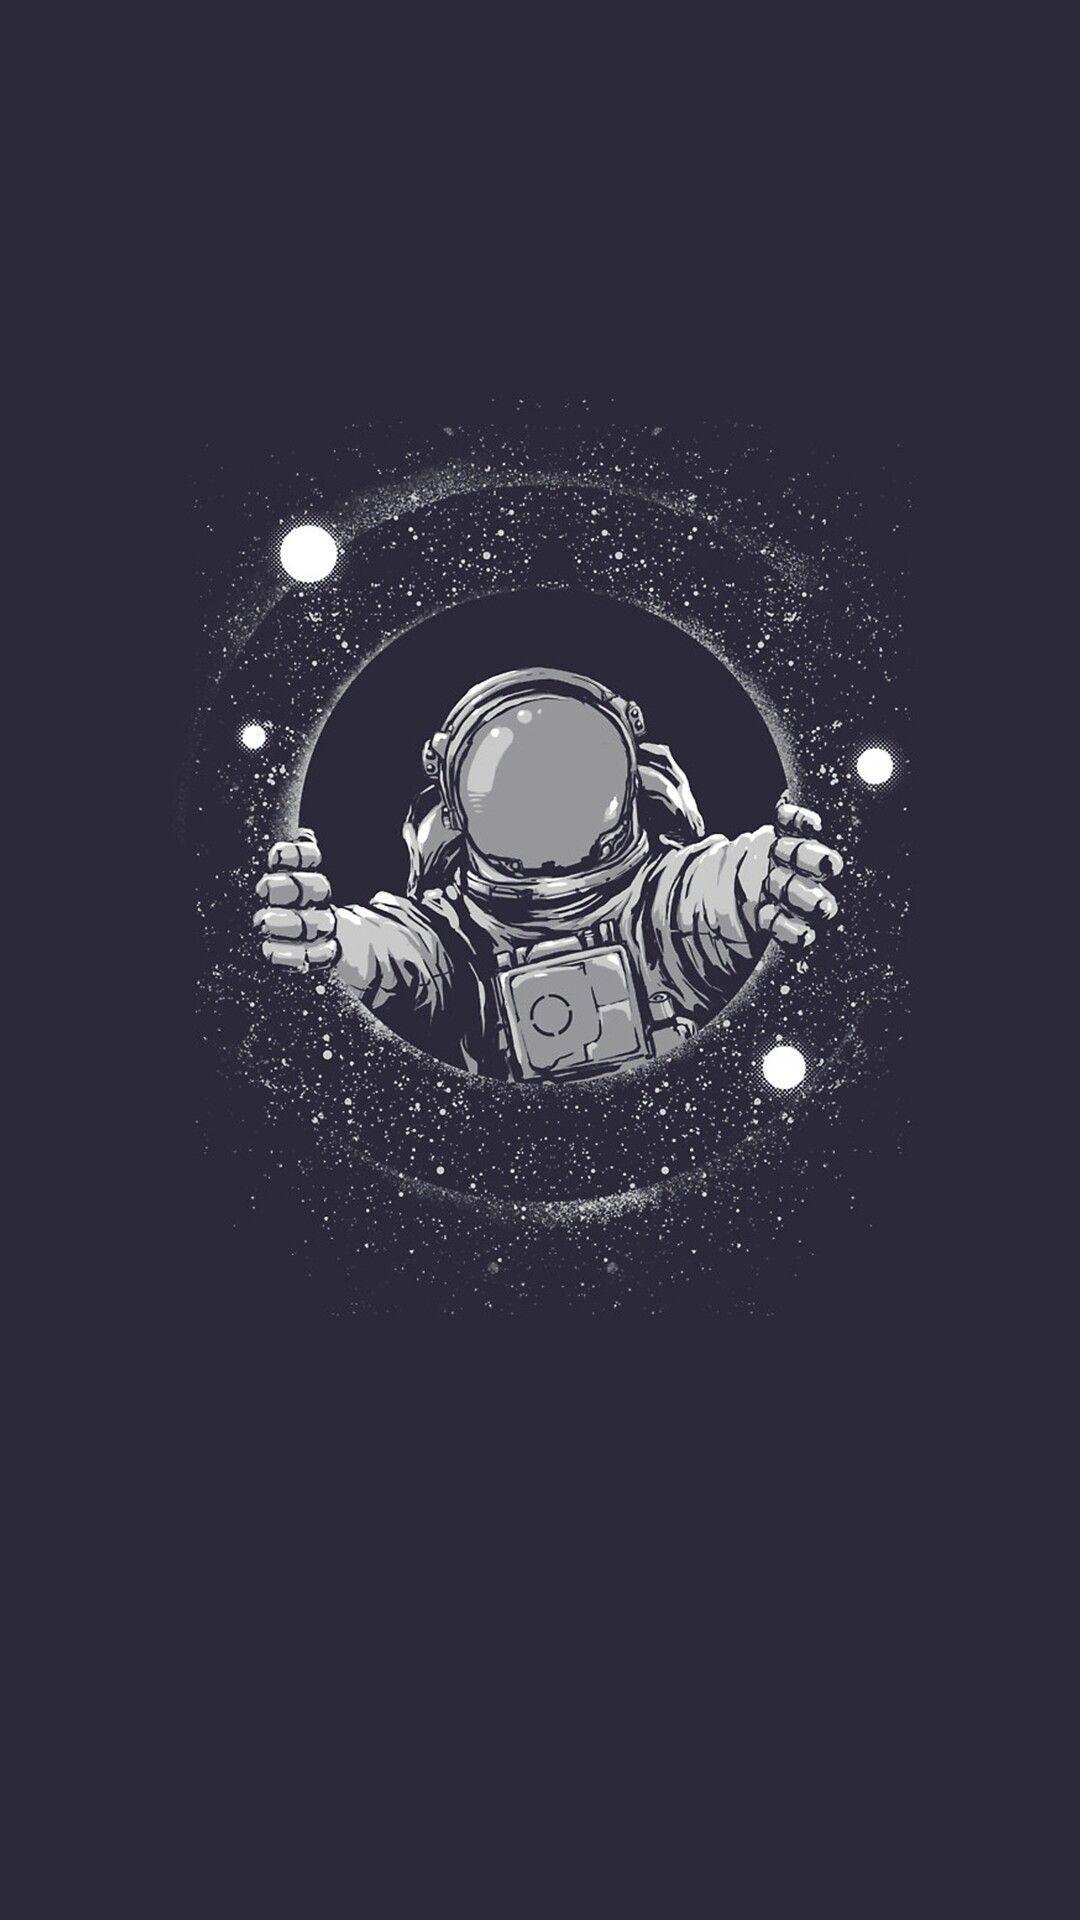 Background Background Background Preto Backgroundpreto Free Idea Astronaut Wallpaper Space Drawings Black Wallpaper Iphone